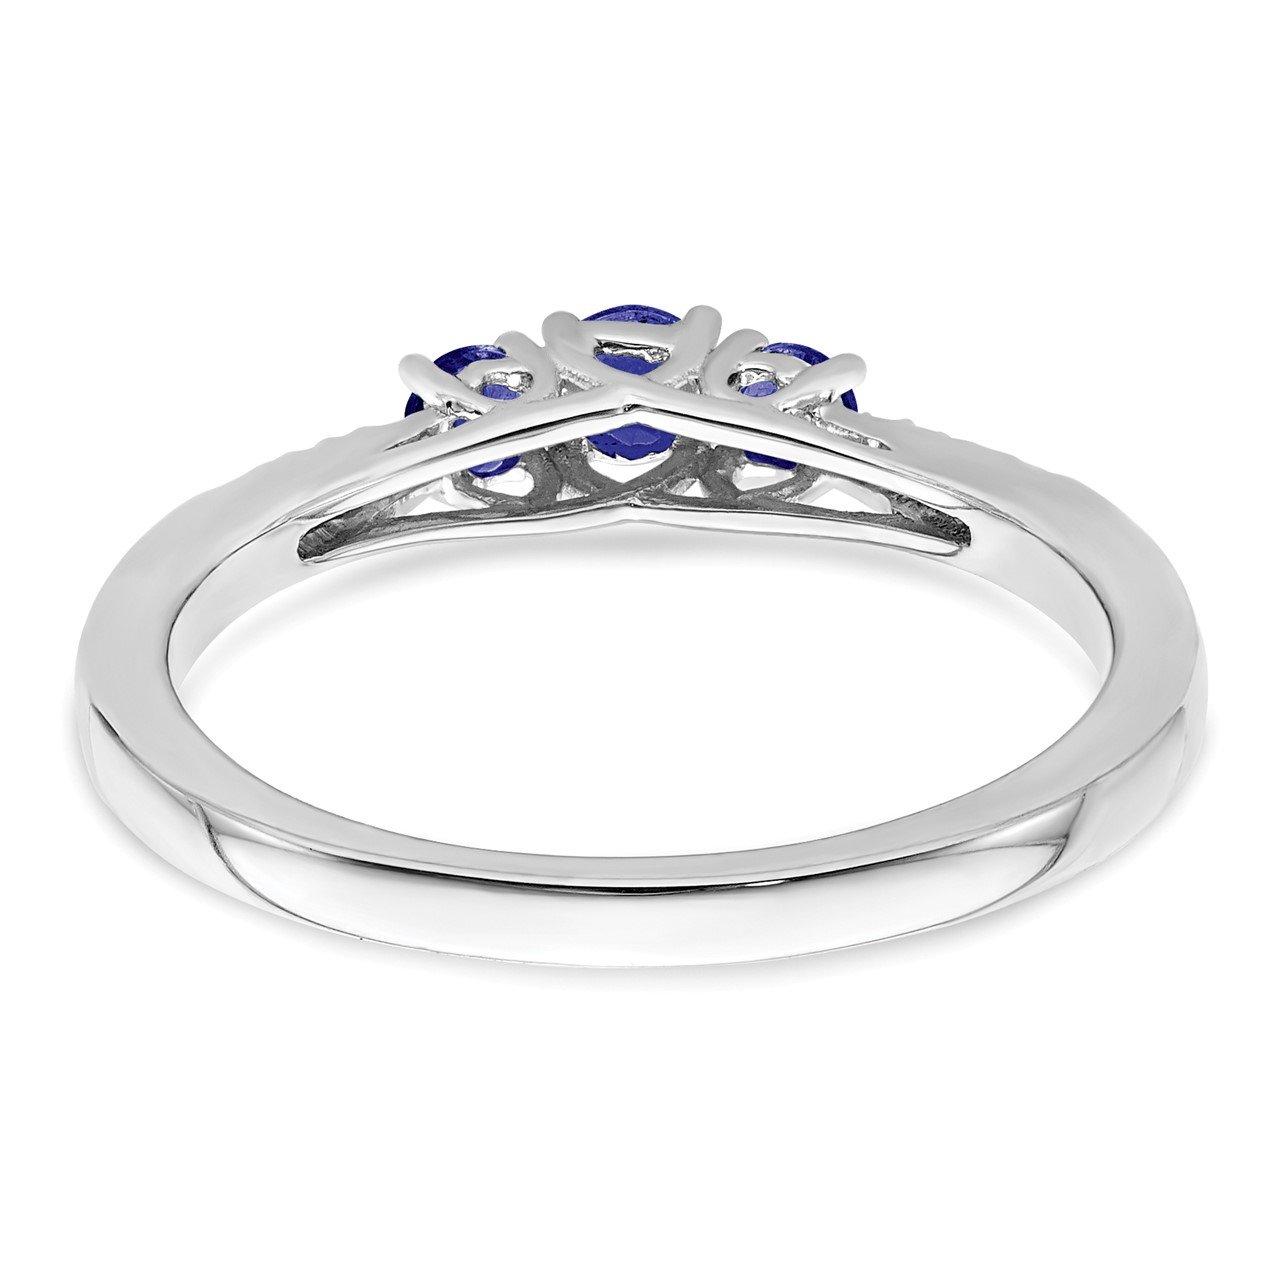 14k White Gold Sapphire and Diamond 3-stone Ring-5